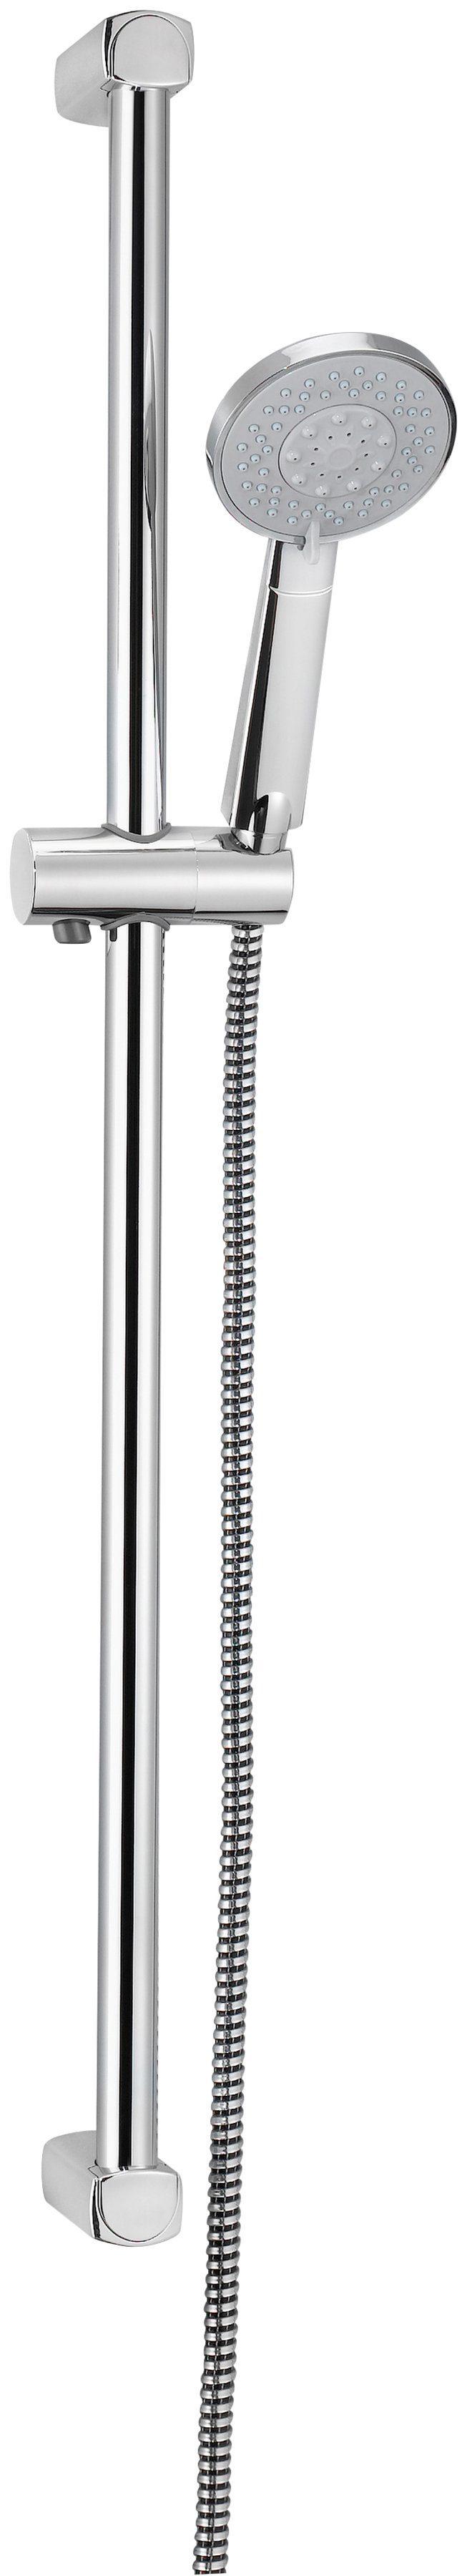 ADOB Brause-Set »Unico V 90 cm«